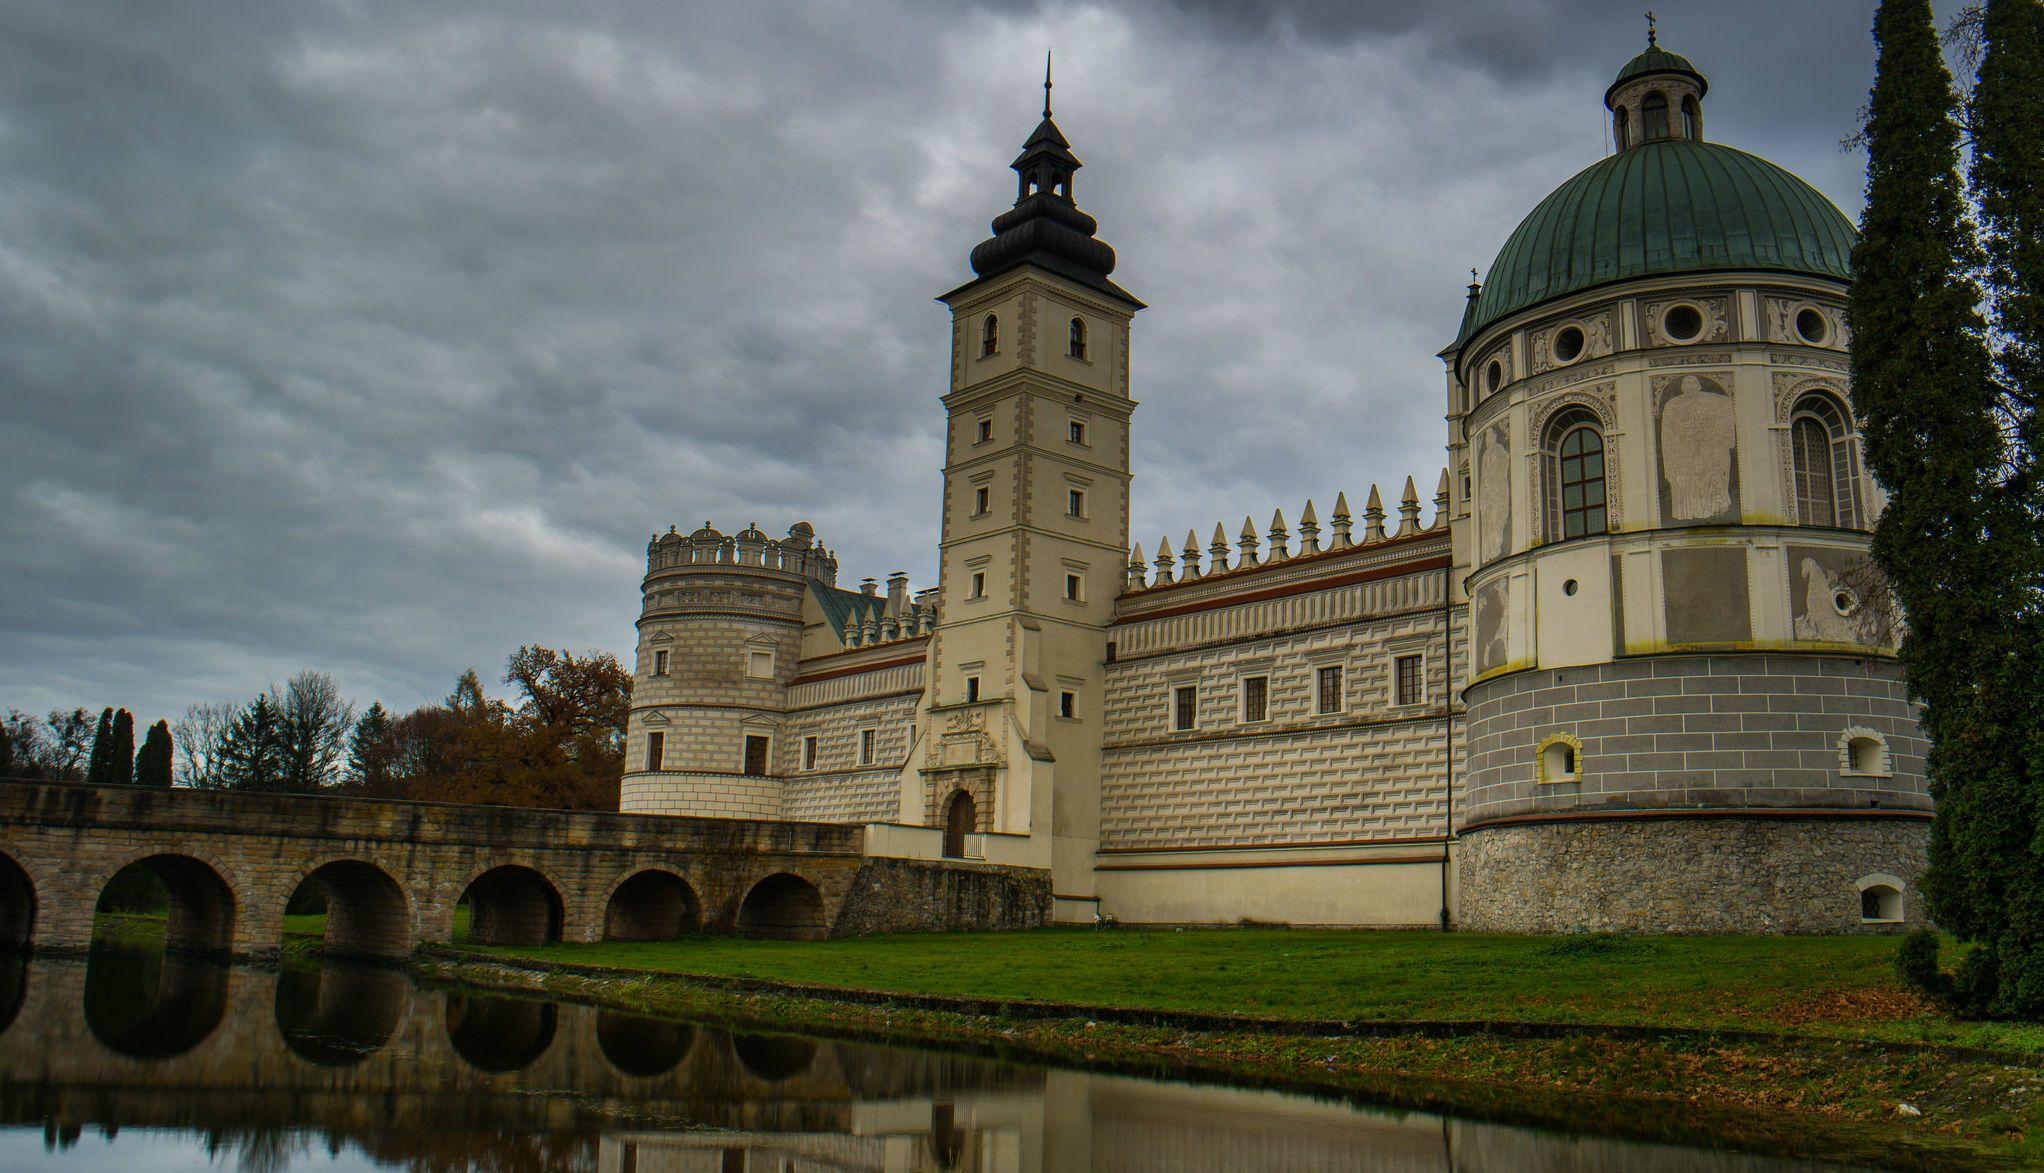 Замок Красіцьких, Перемишль, Польща